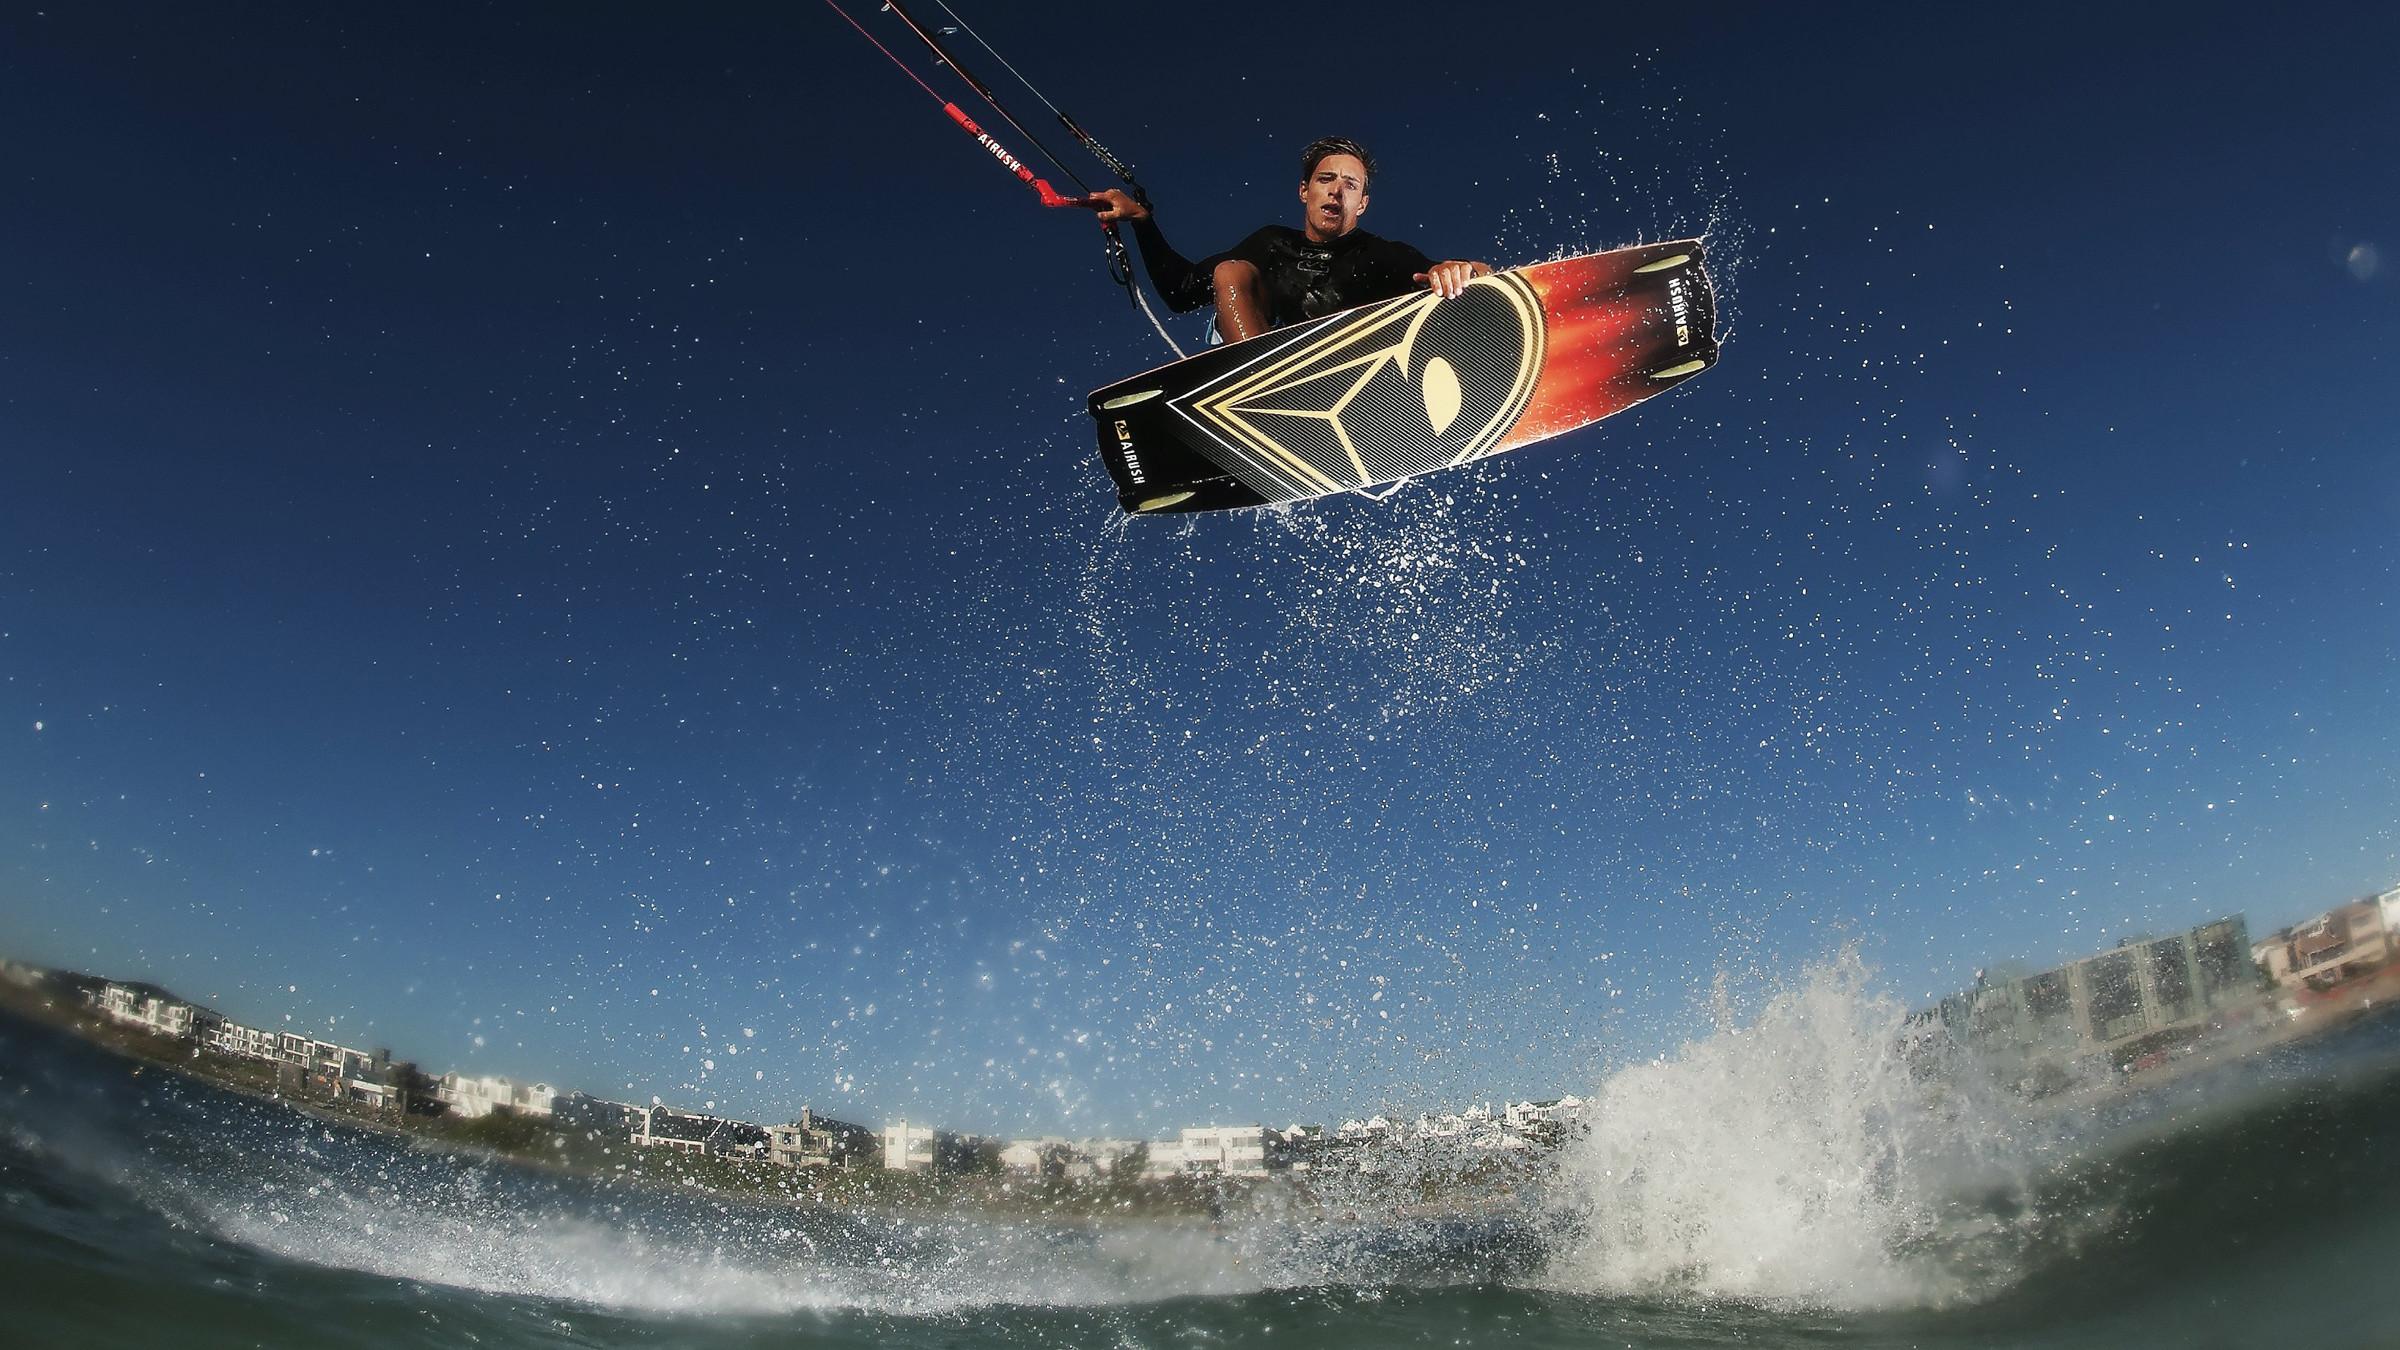 … airush-kiteboarding-oswald-smith-indie-grab-hd-1.jpg.